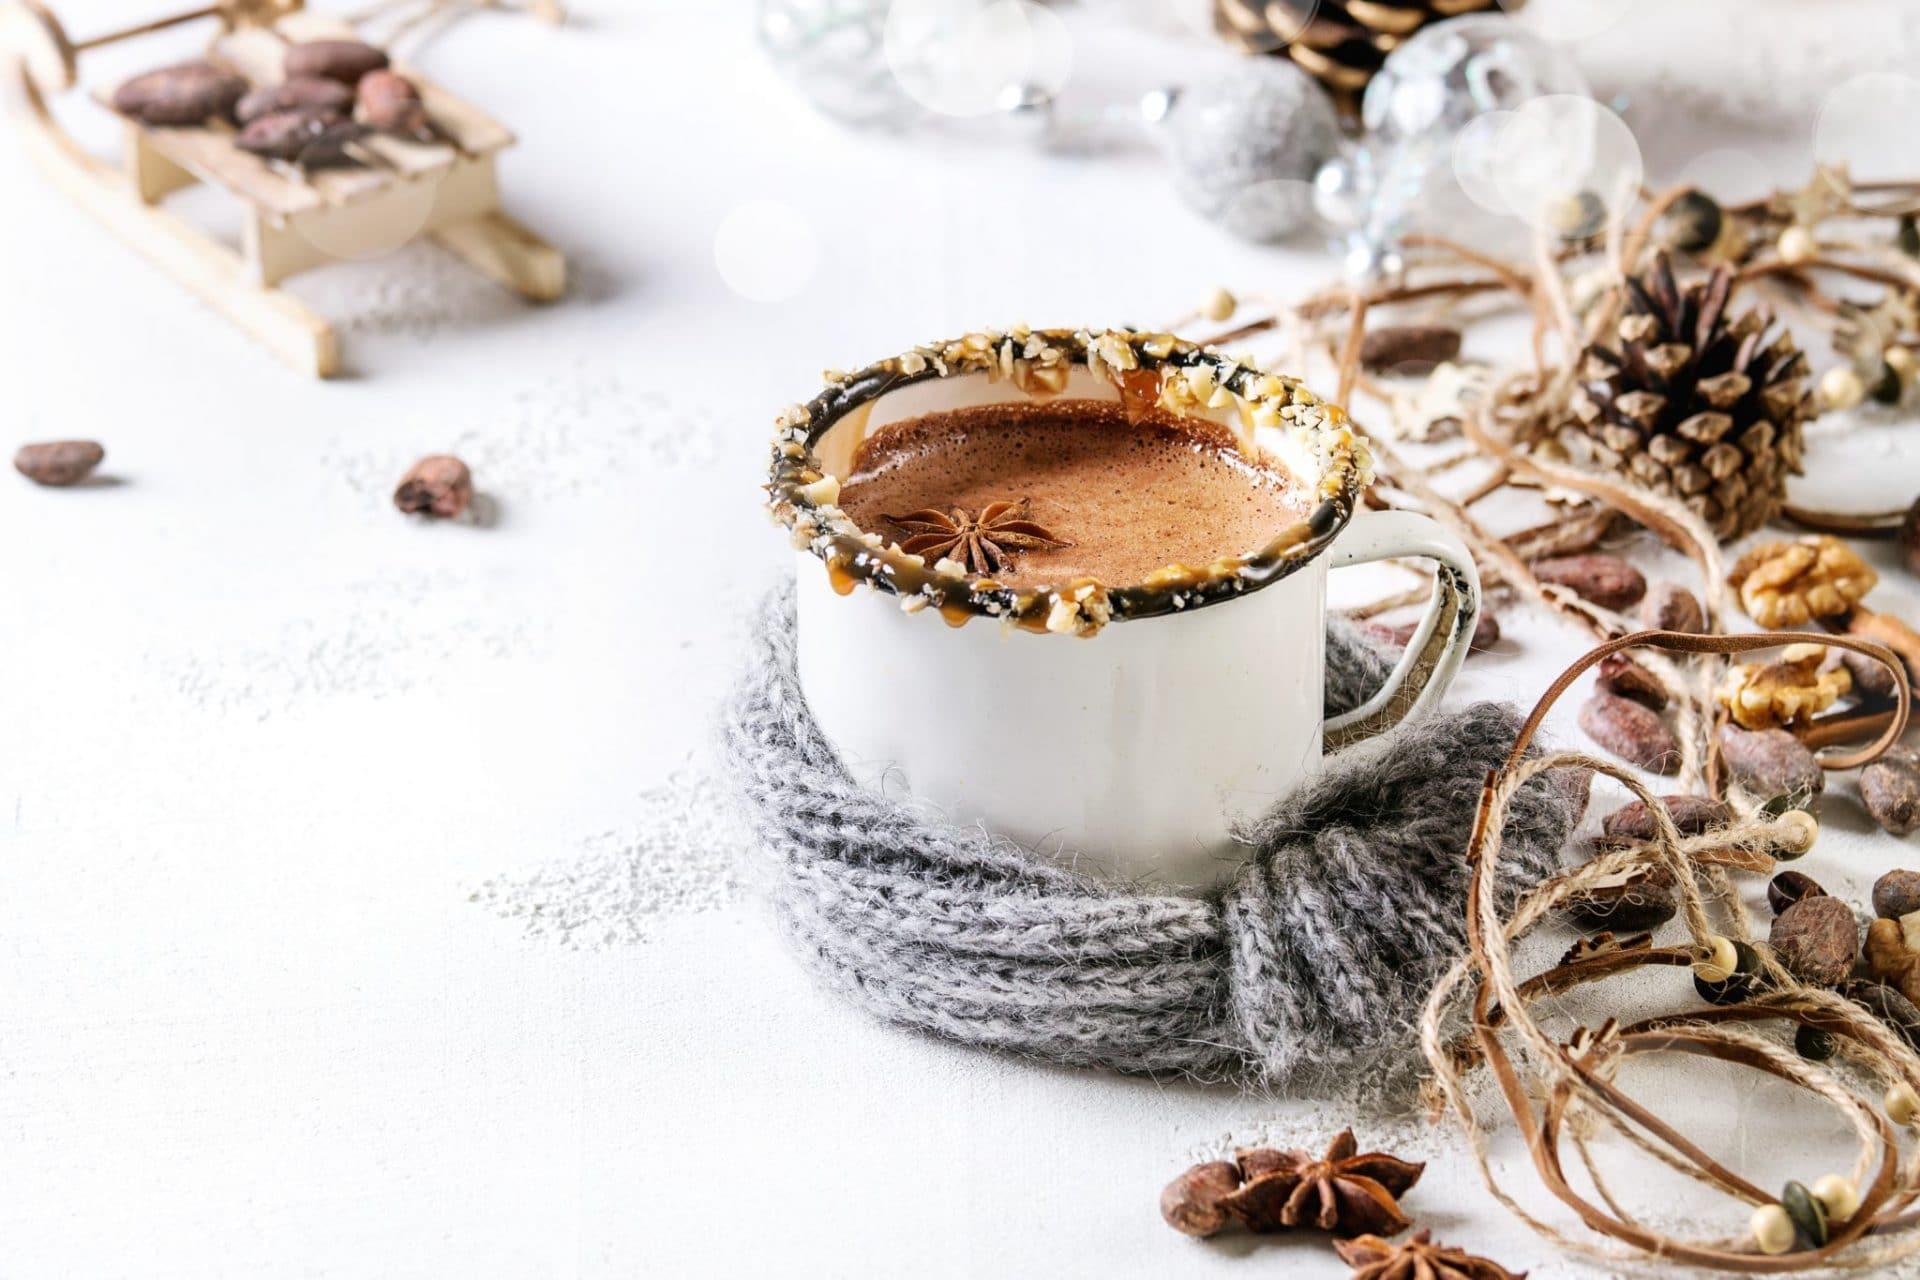 Mug of hot chocolate